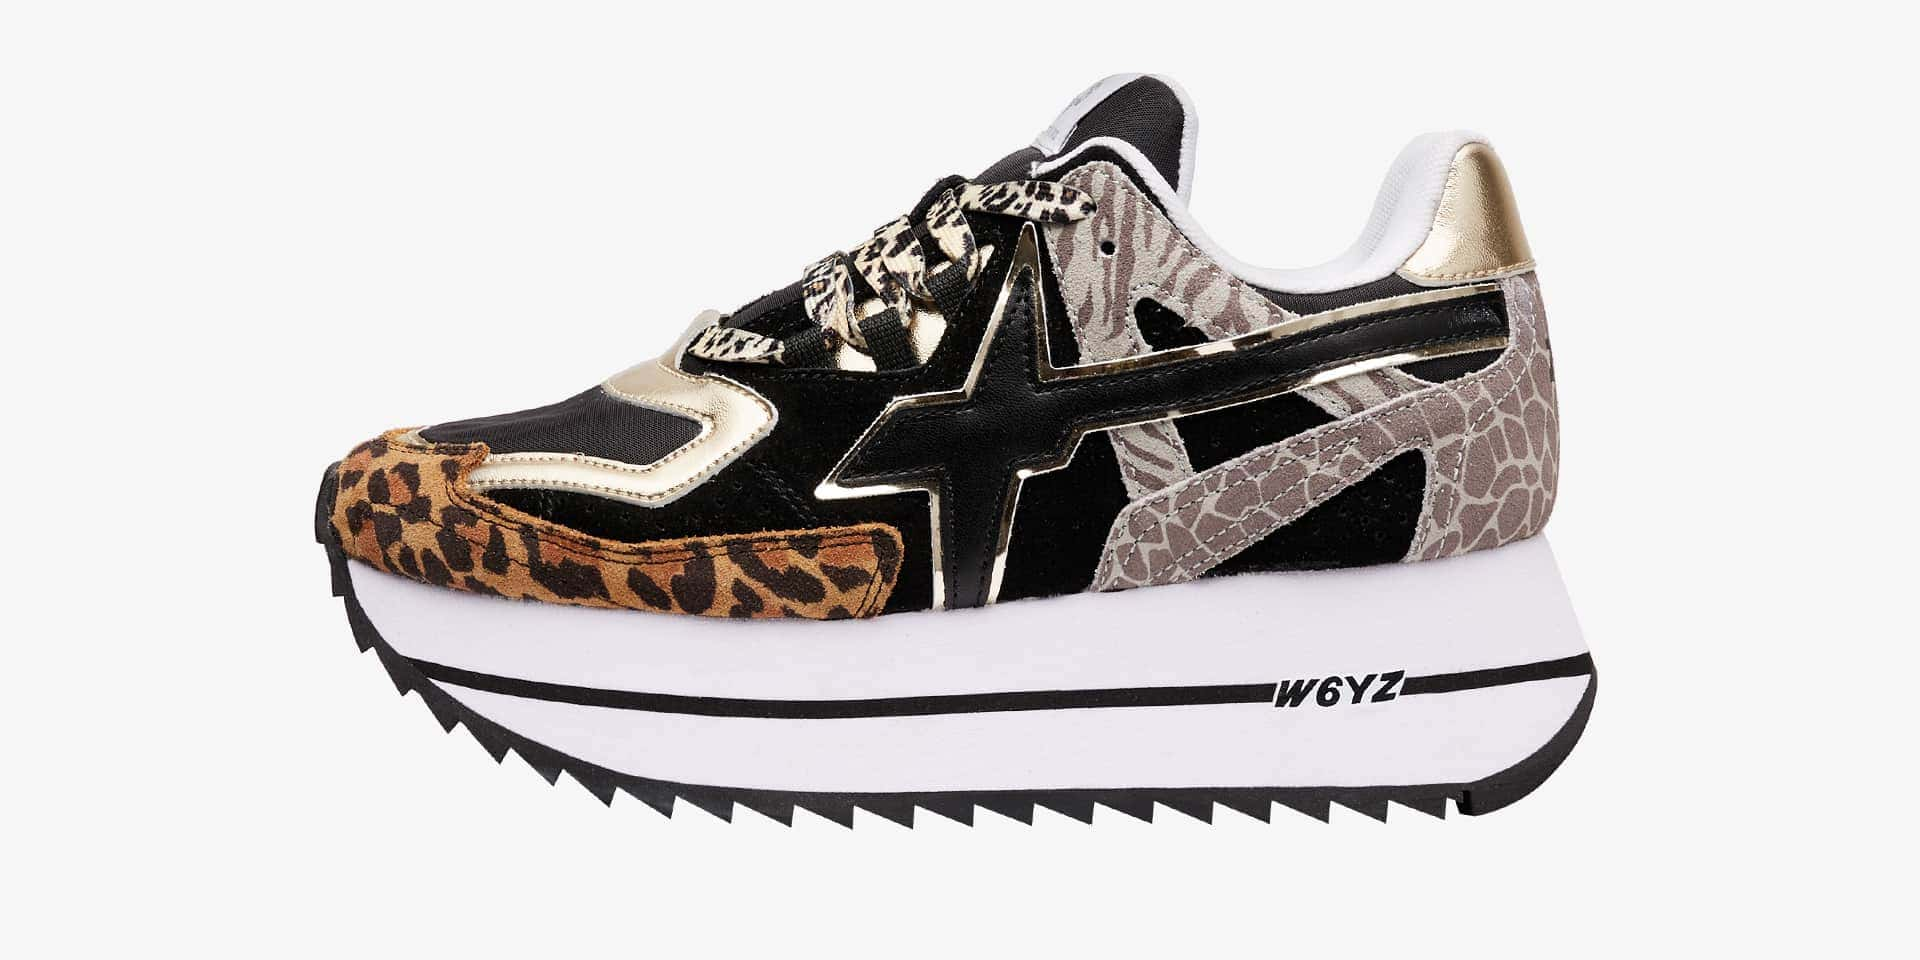 DEB-W. - Technical fabric and animal-print sneakers - Animal print